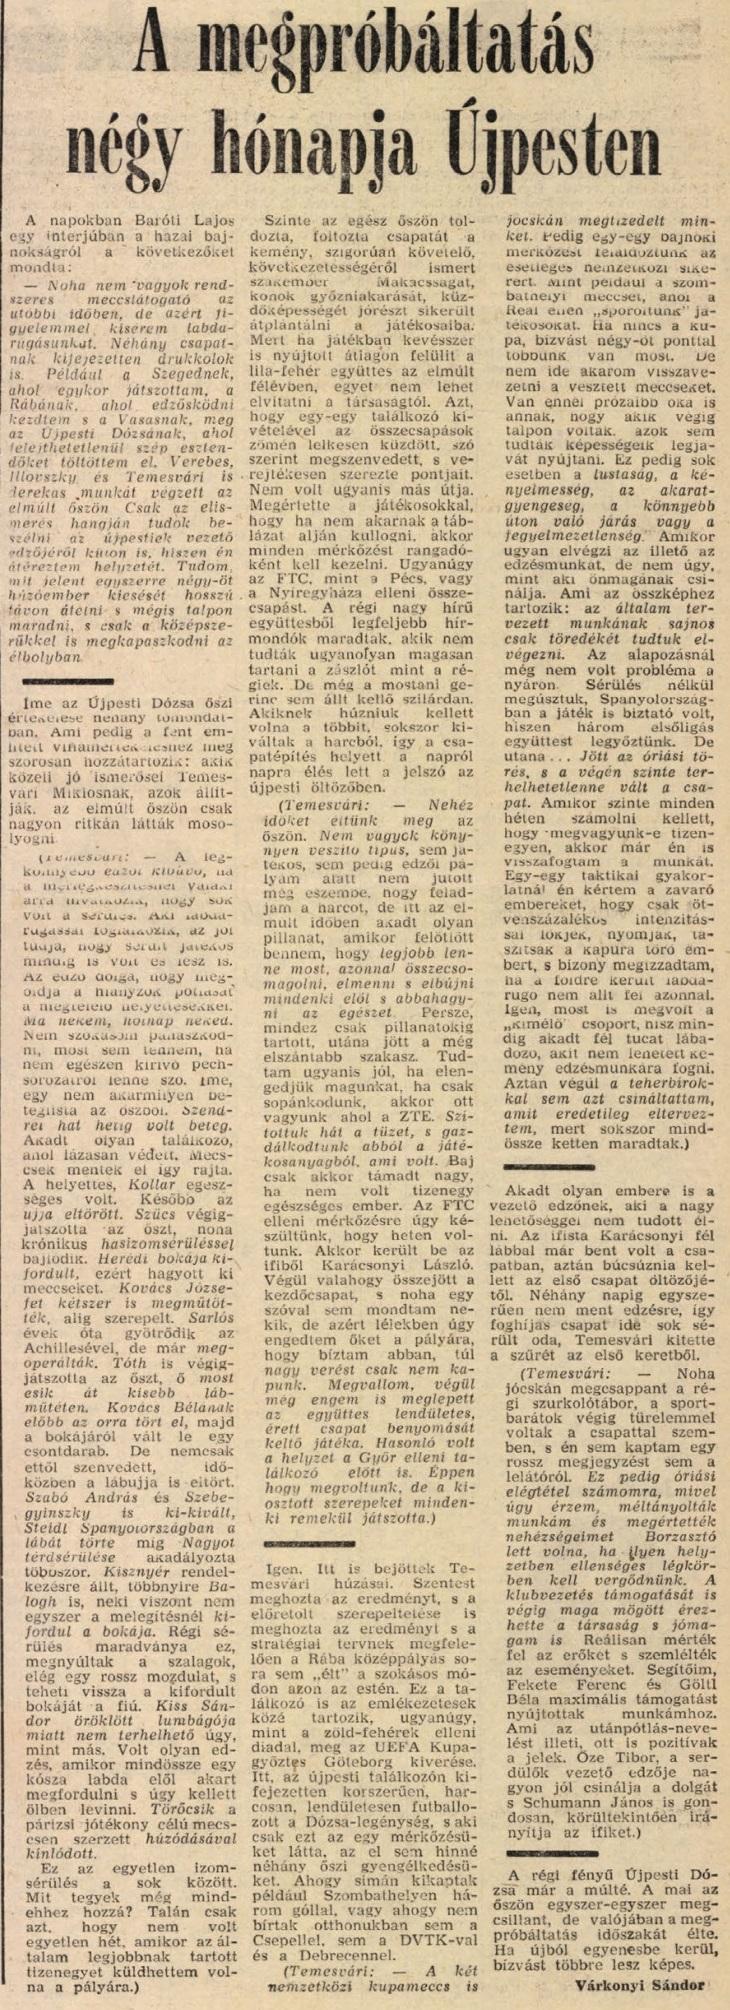 idokapszula_nb_i_1982_83_oszi_zaras_merlegen_a_felsohaz_5_u_dozsa.jpg